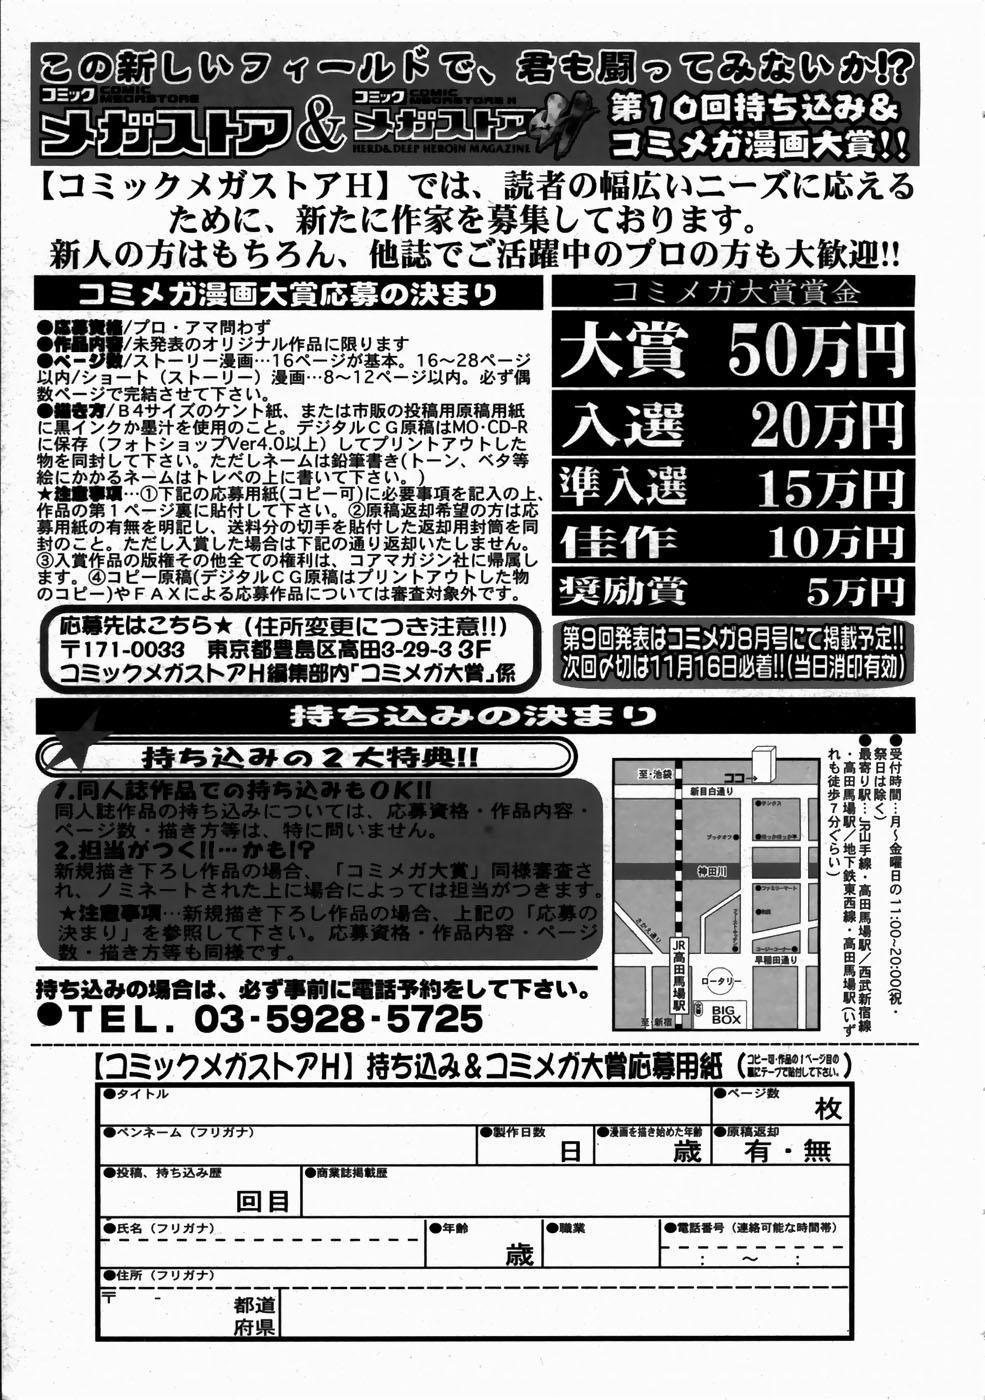 COMIC Megastore H 2003-07 266